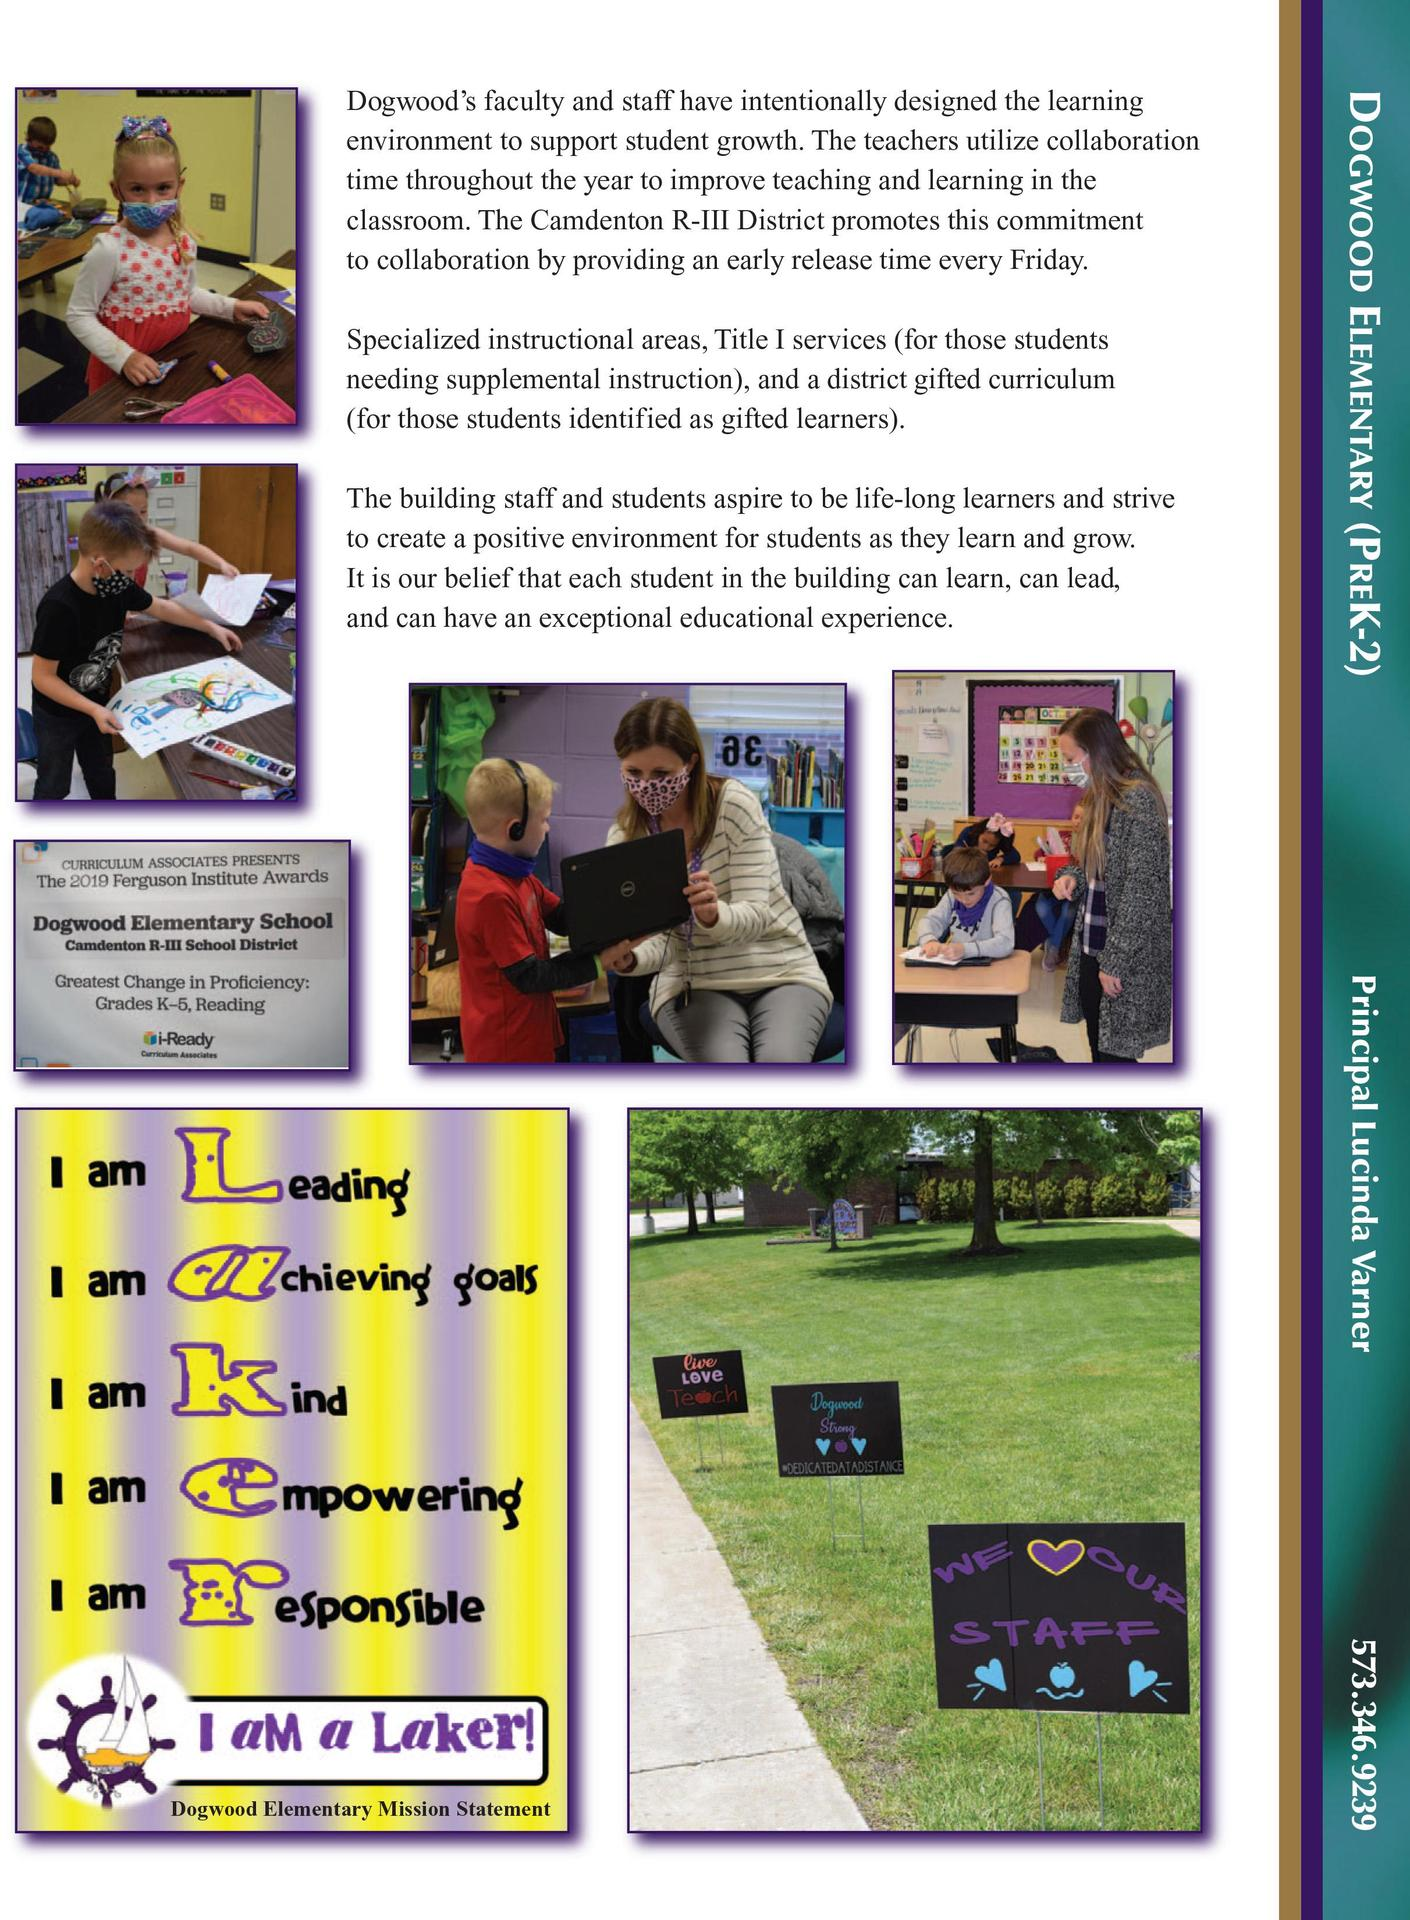 Dogwood Elementary Profile page 2